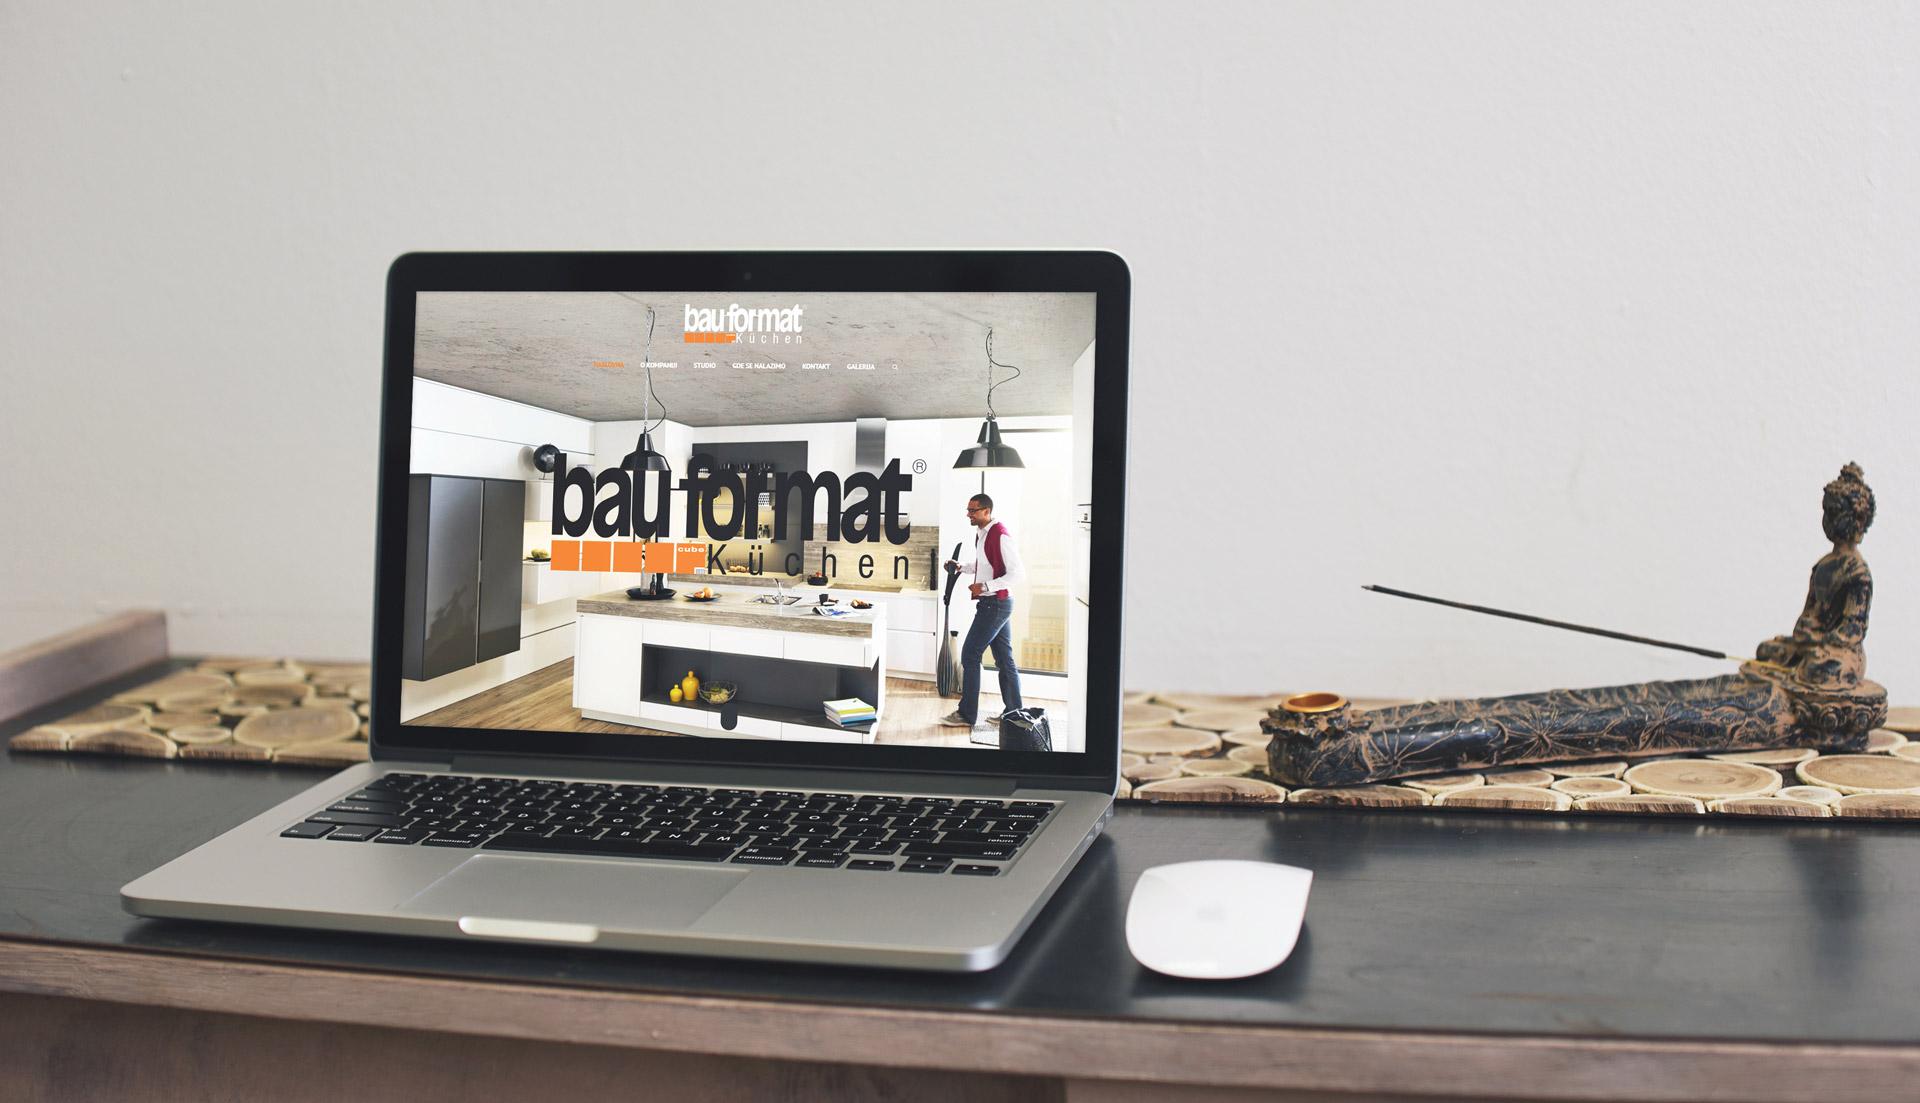 bauformat web design